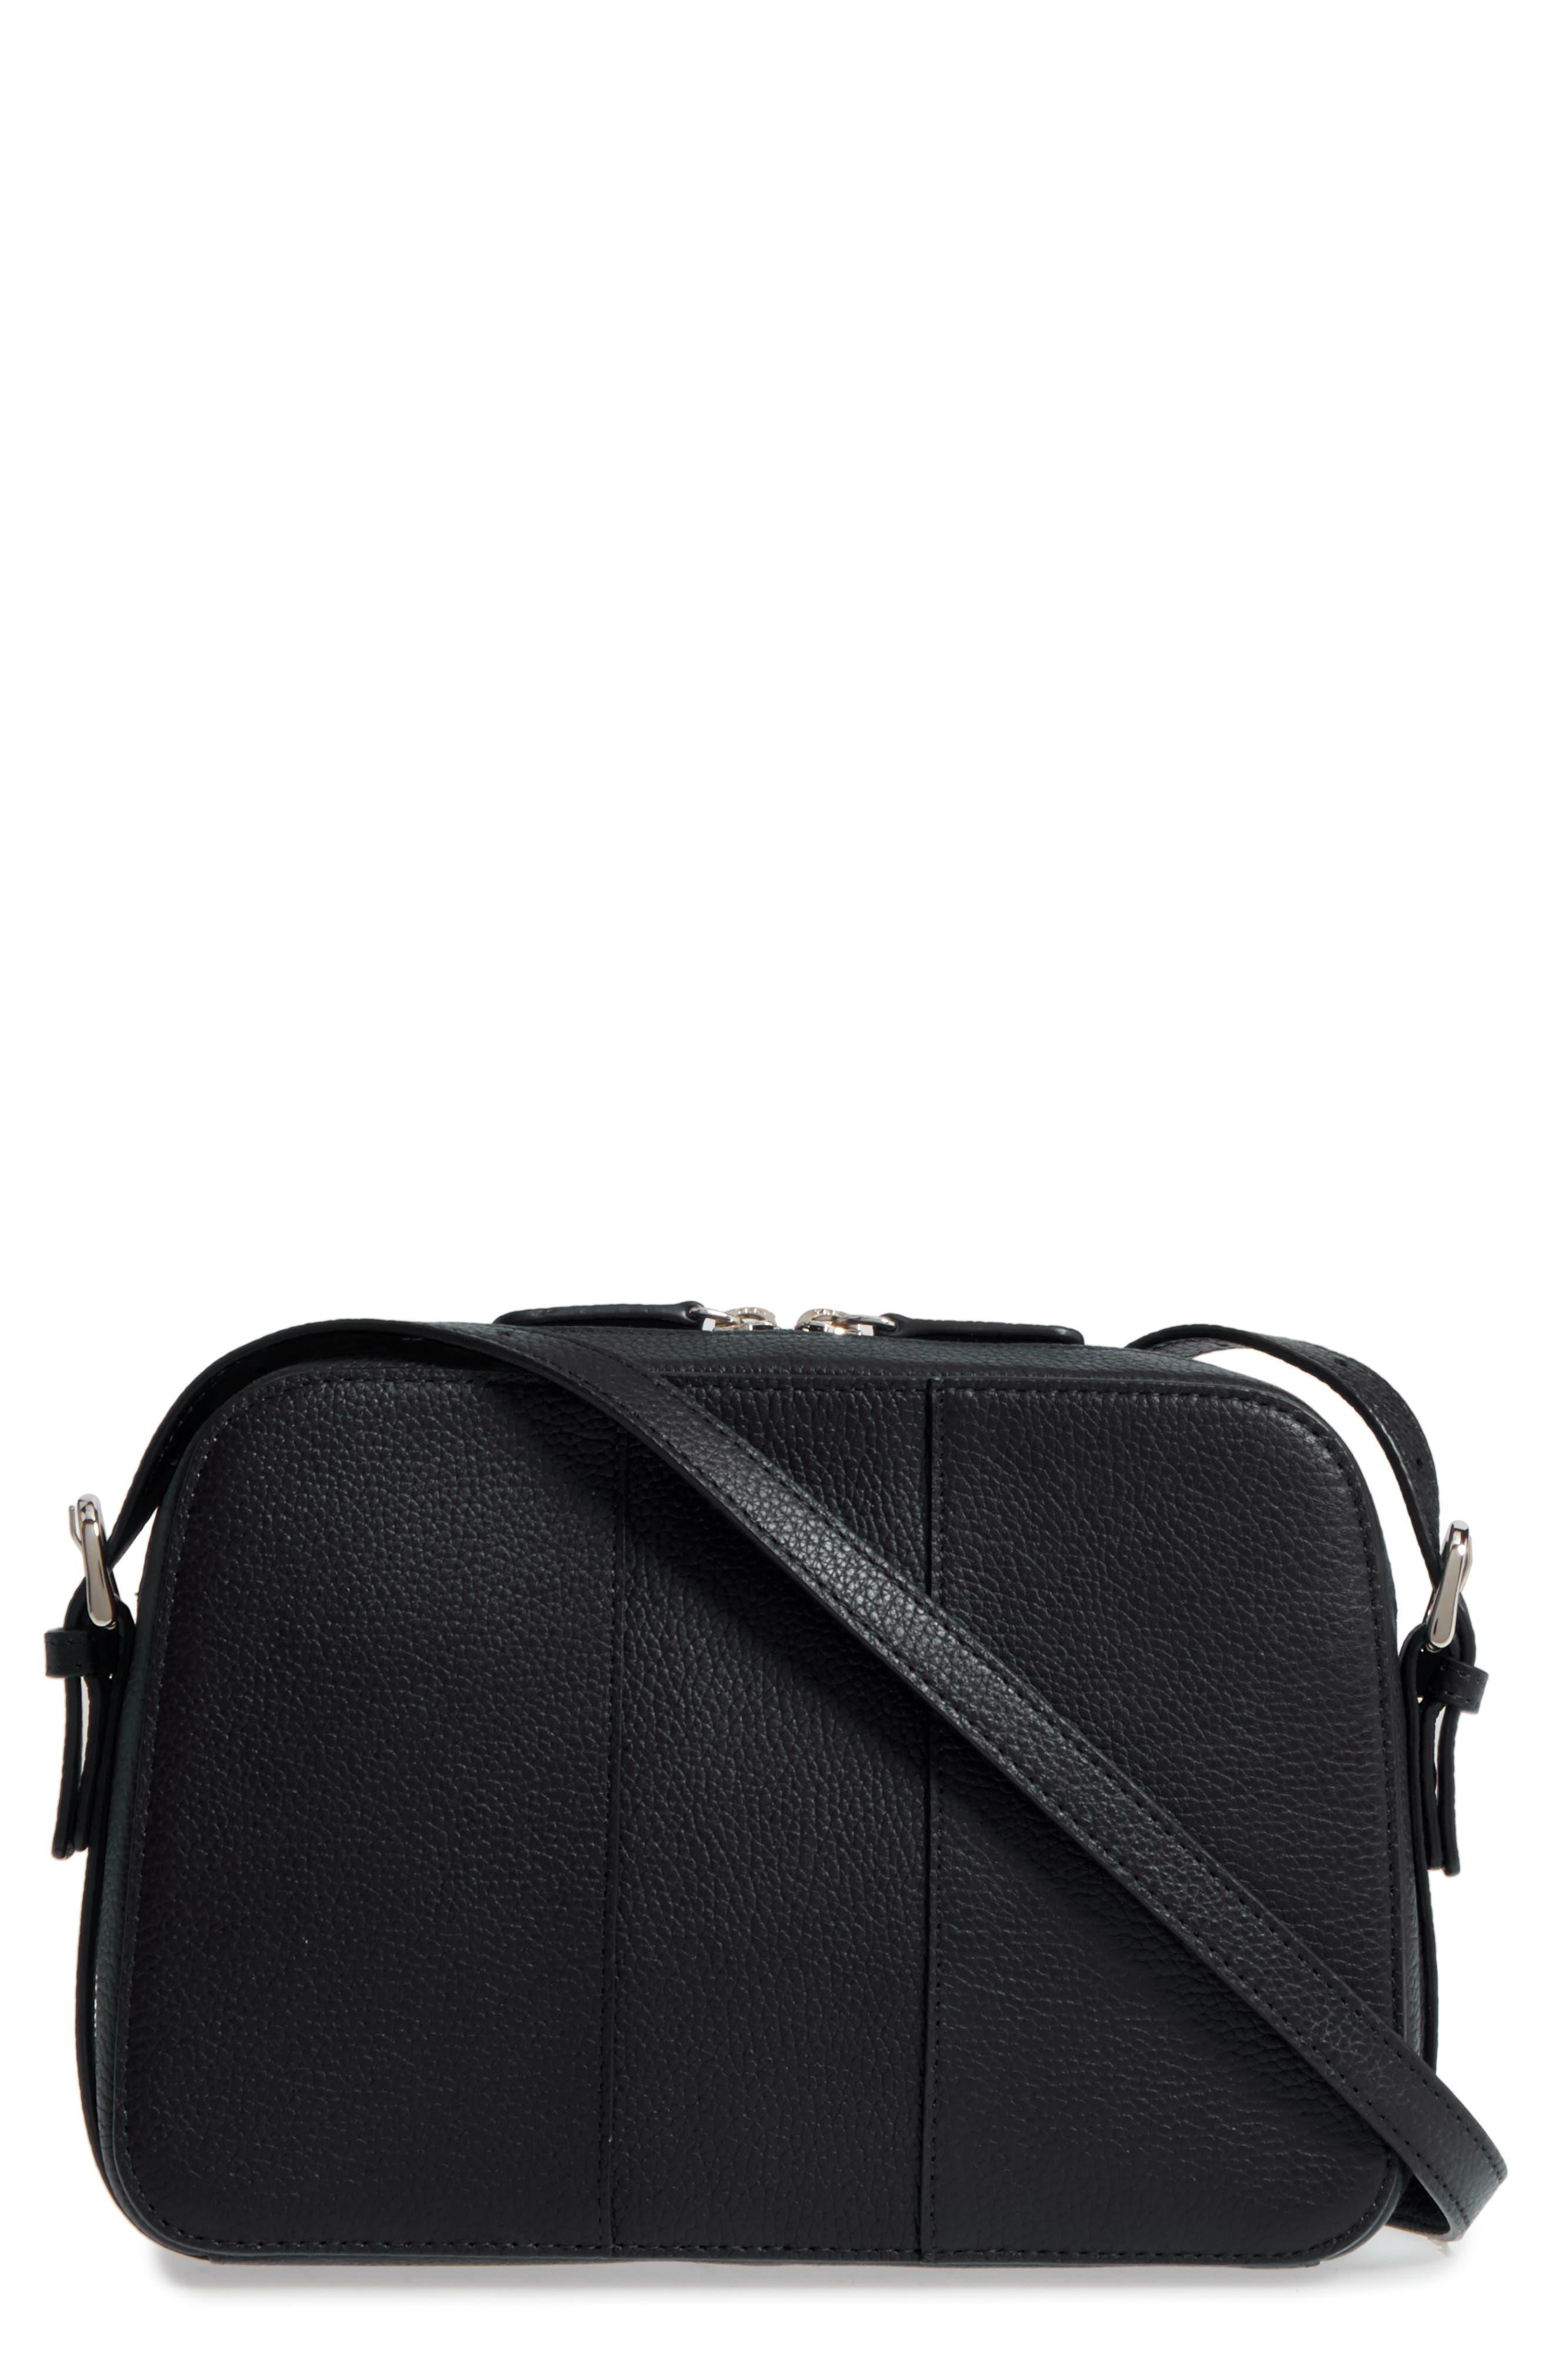 Brayden Leather Crossbody Camera Bag,                             Main thumbnail 1, color,                             001